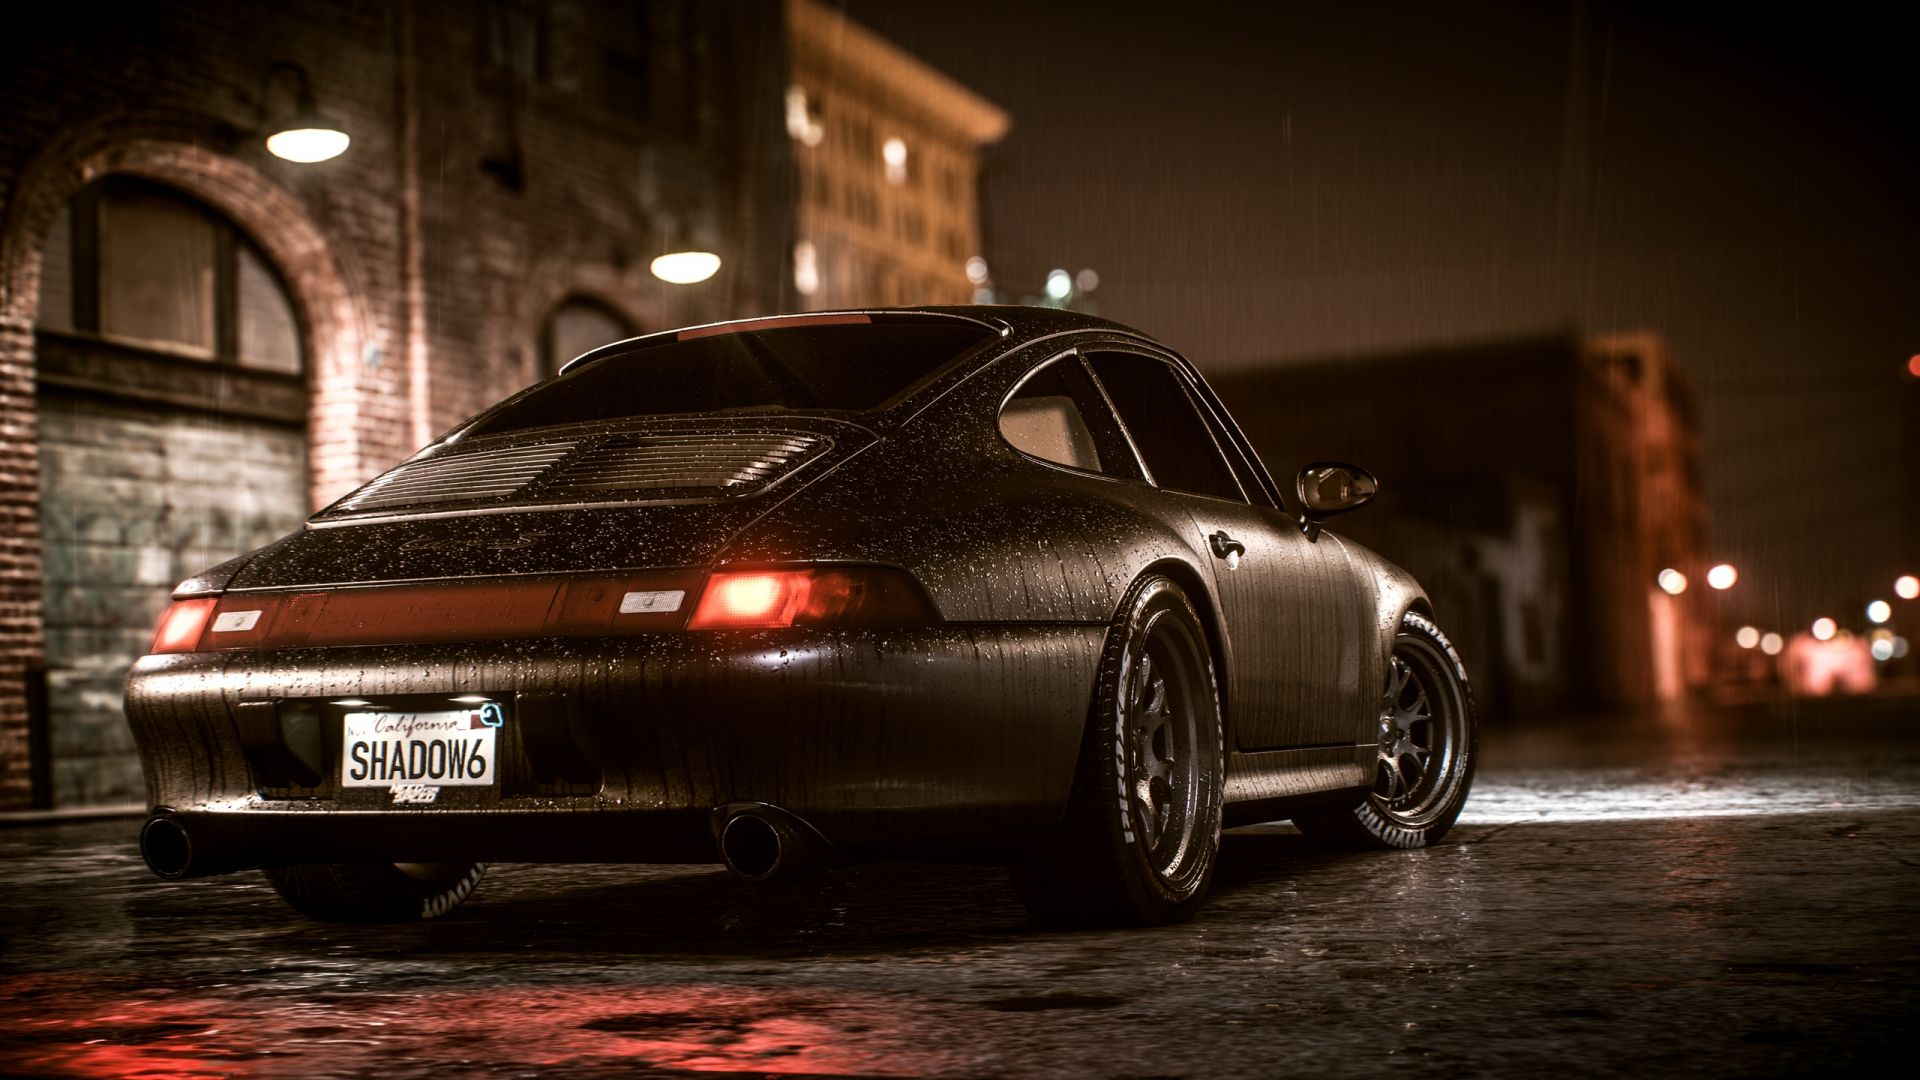 Desktop Wallpaper Need For Speed Payback Sports Car Night Rain